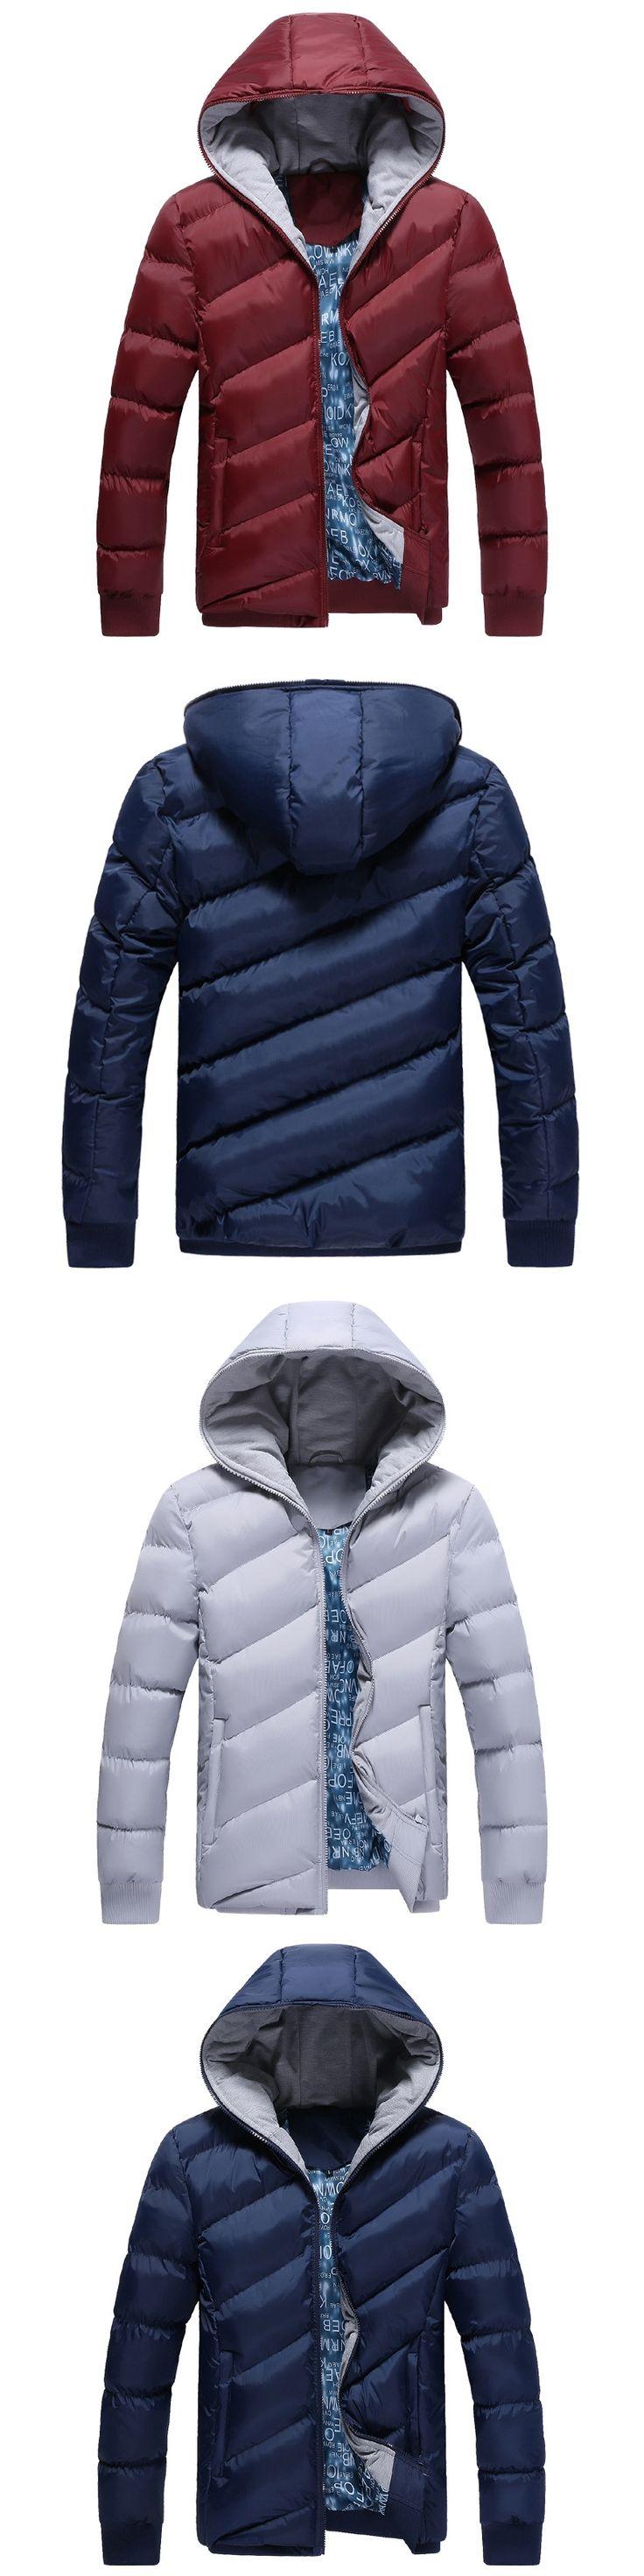 Uwback 2017 Winter Men Down Jackets Hooded Casual Coats Homme Black Navy Warm Parkas Hombre Thick Padded Cotton Coats 4XL  XA120